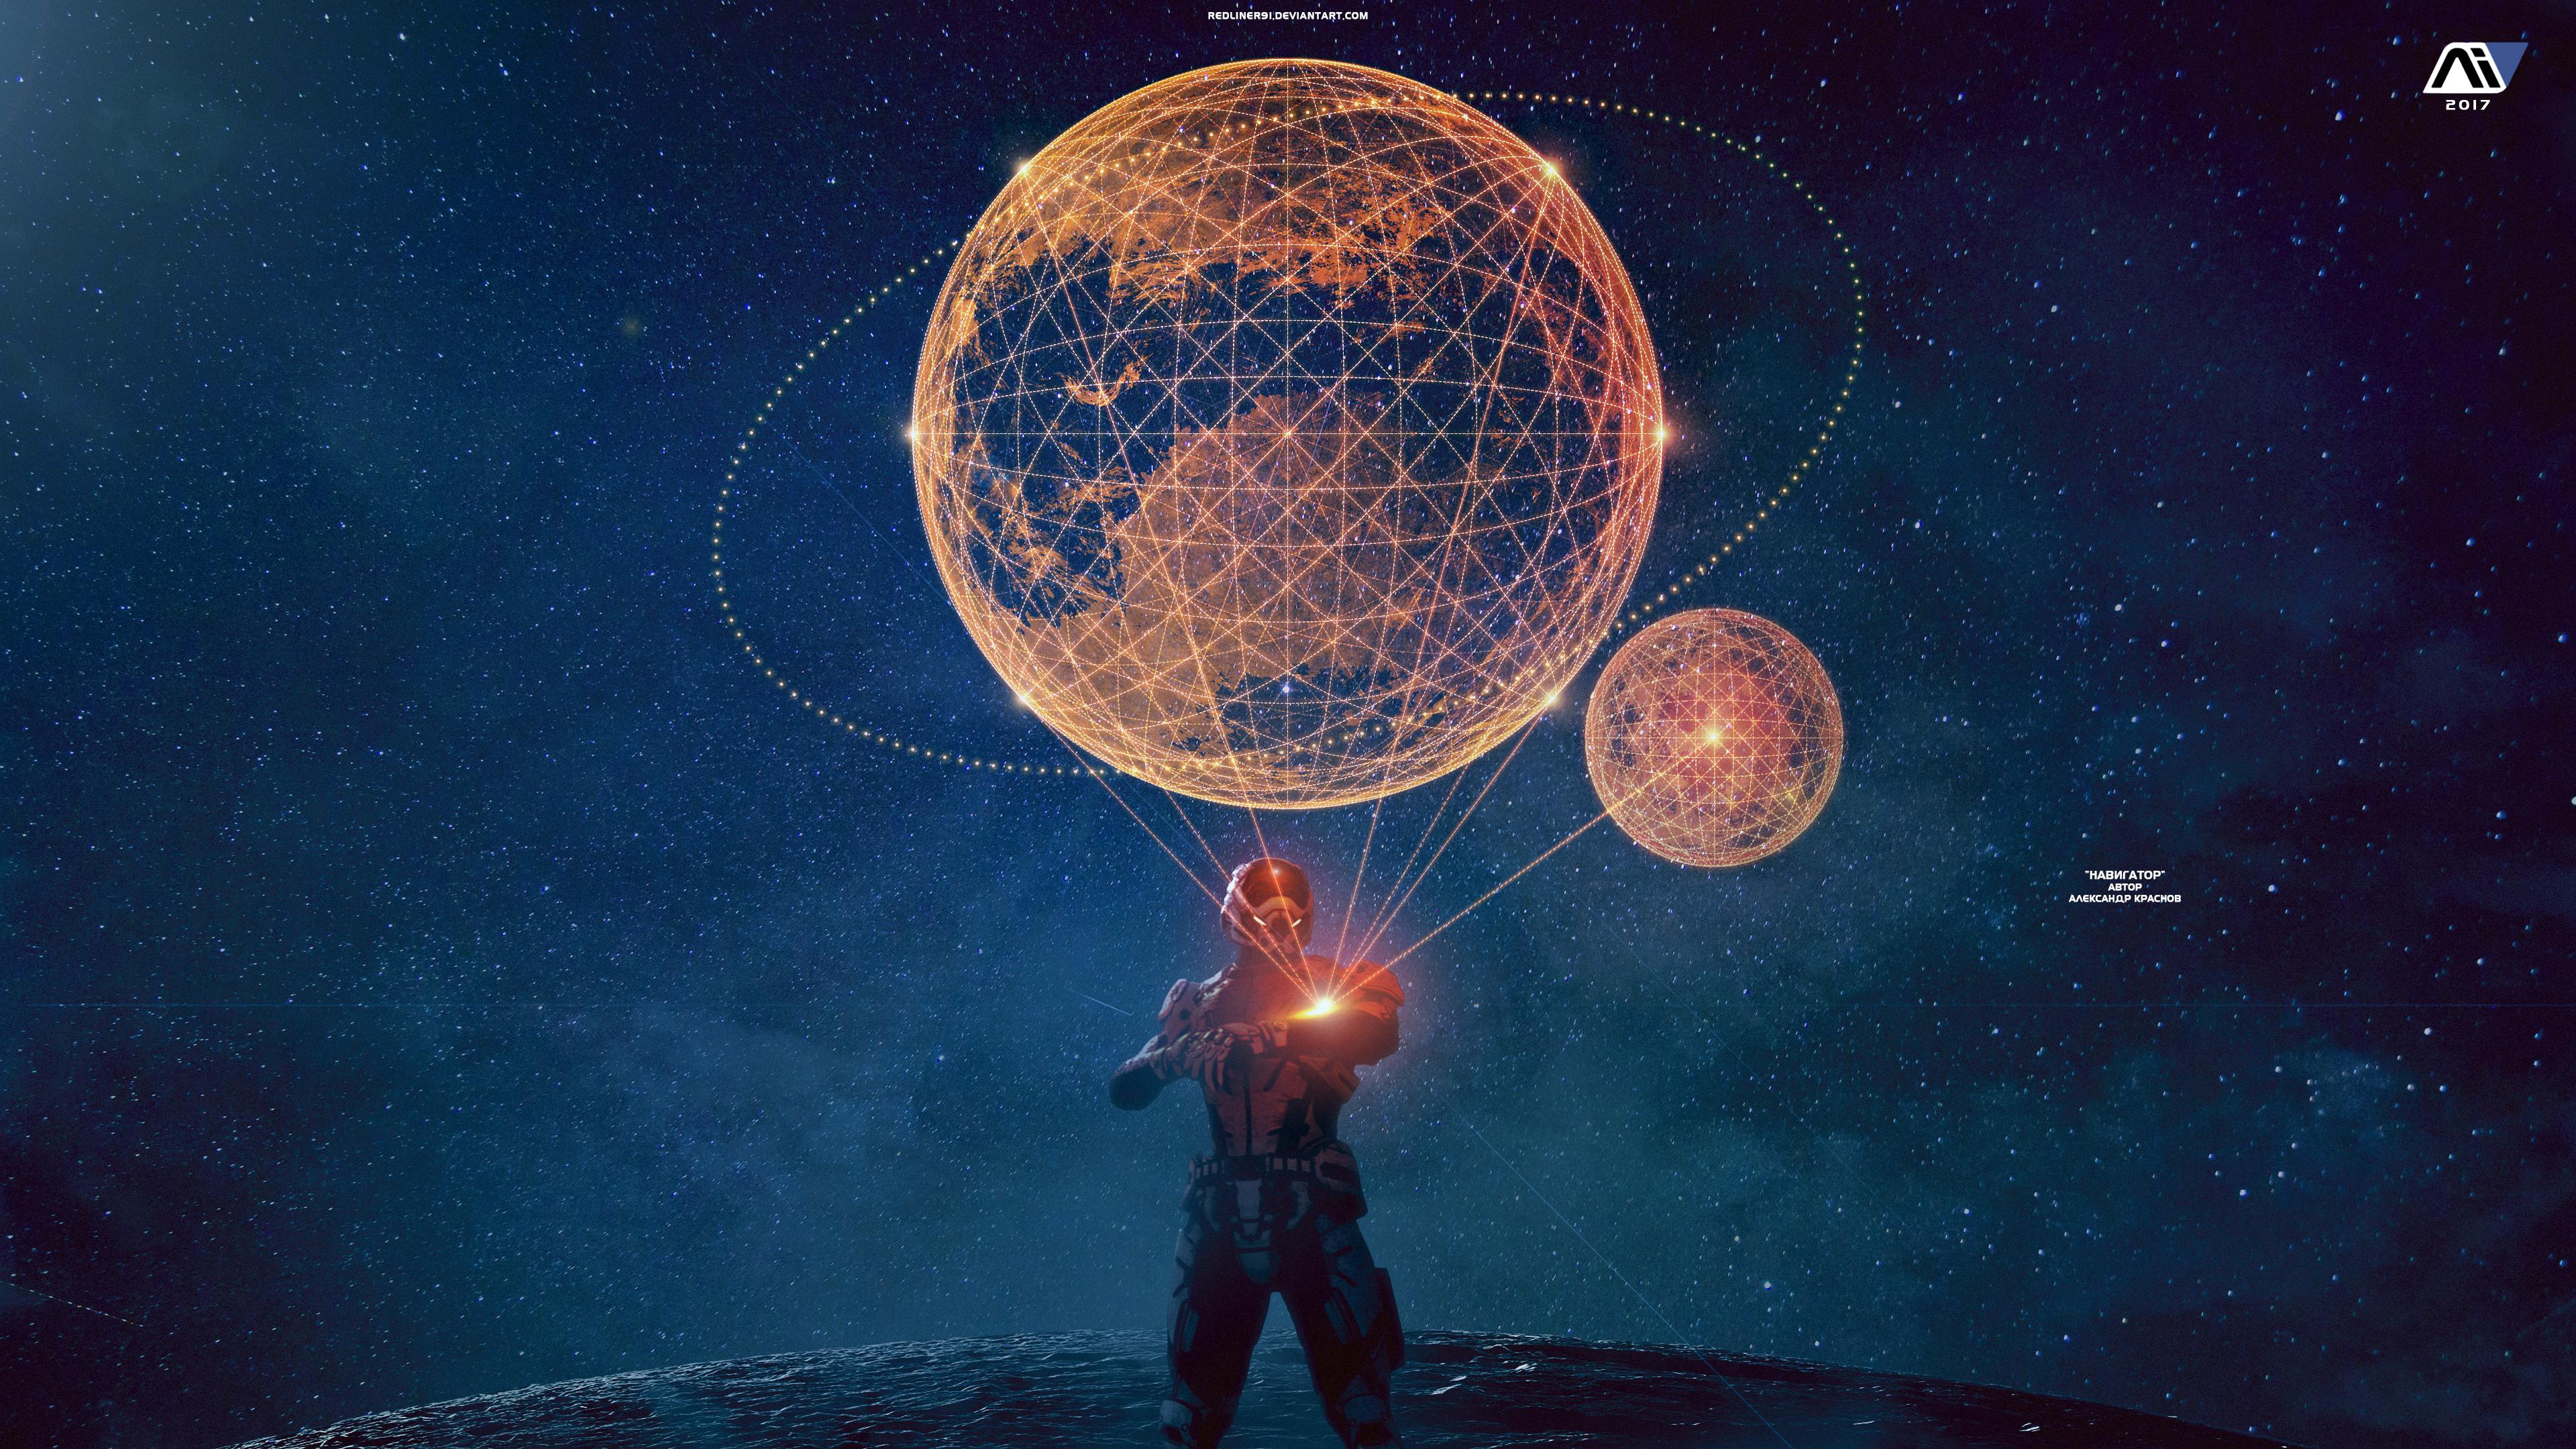 Navigator - Mass Effect Andromeda Wallpaper 4K